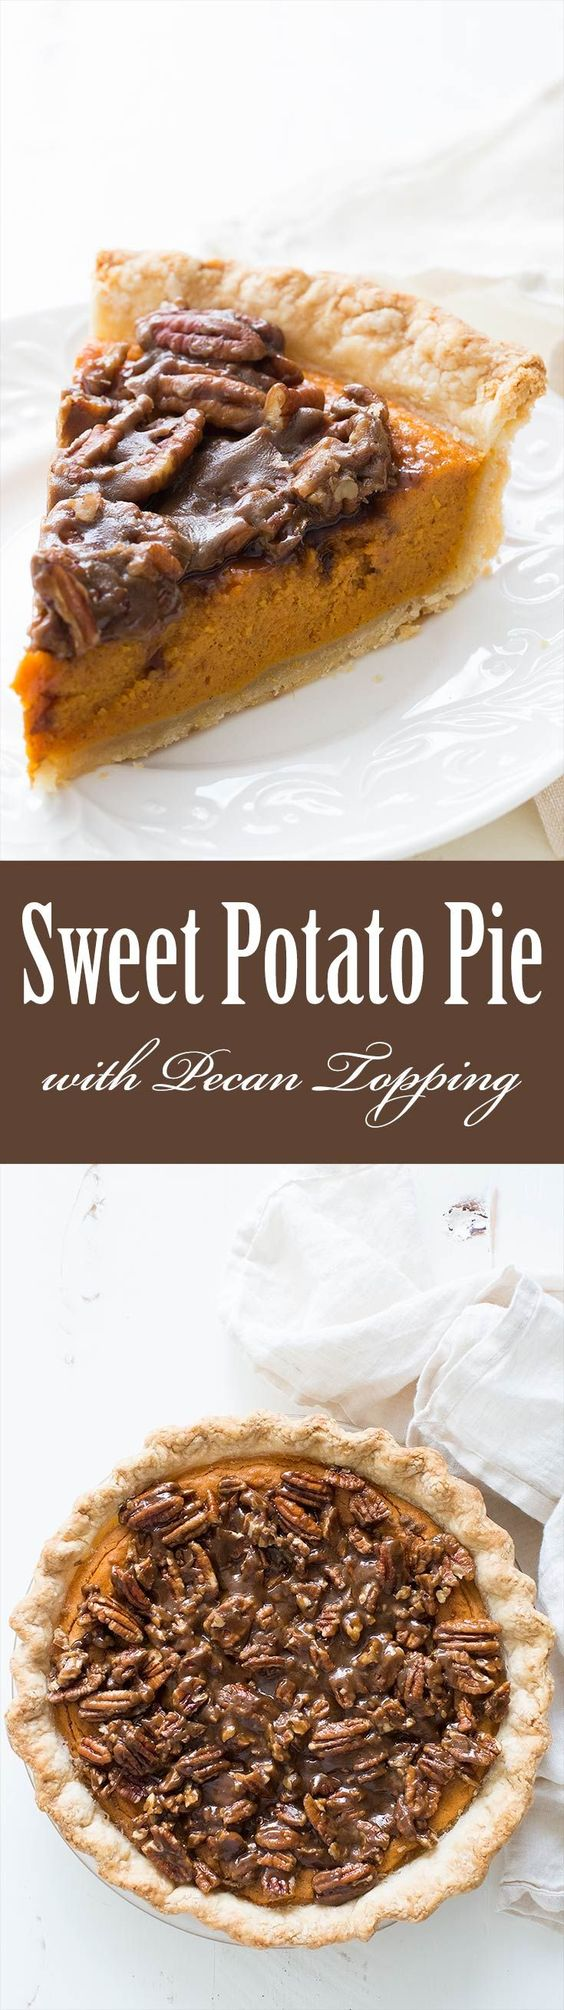 potato pie pecans pies potatoes candied pecans condensed milk sweet ...